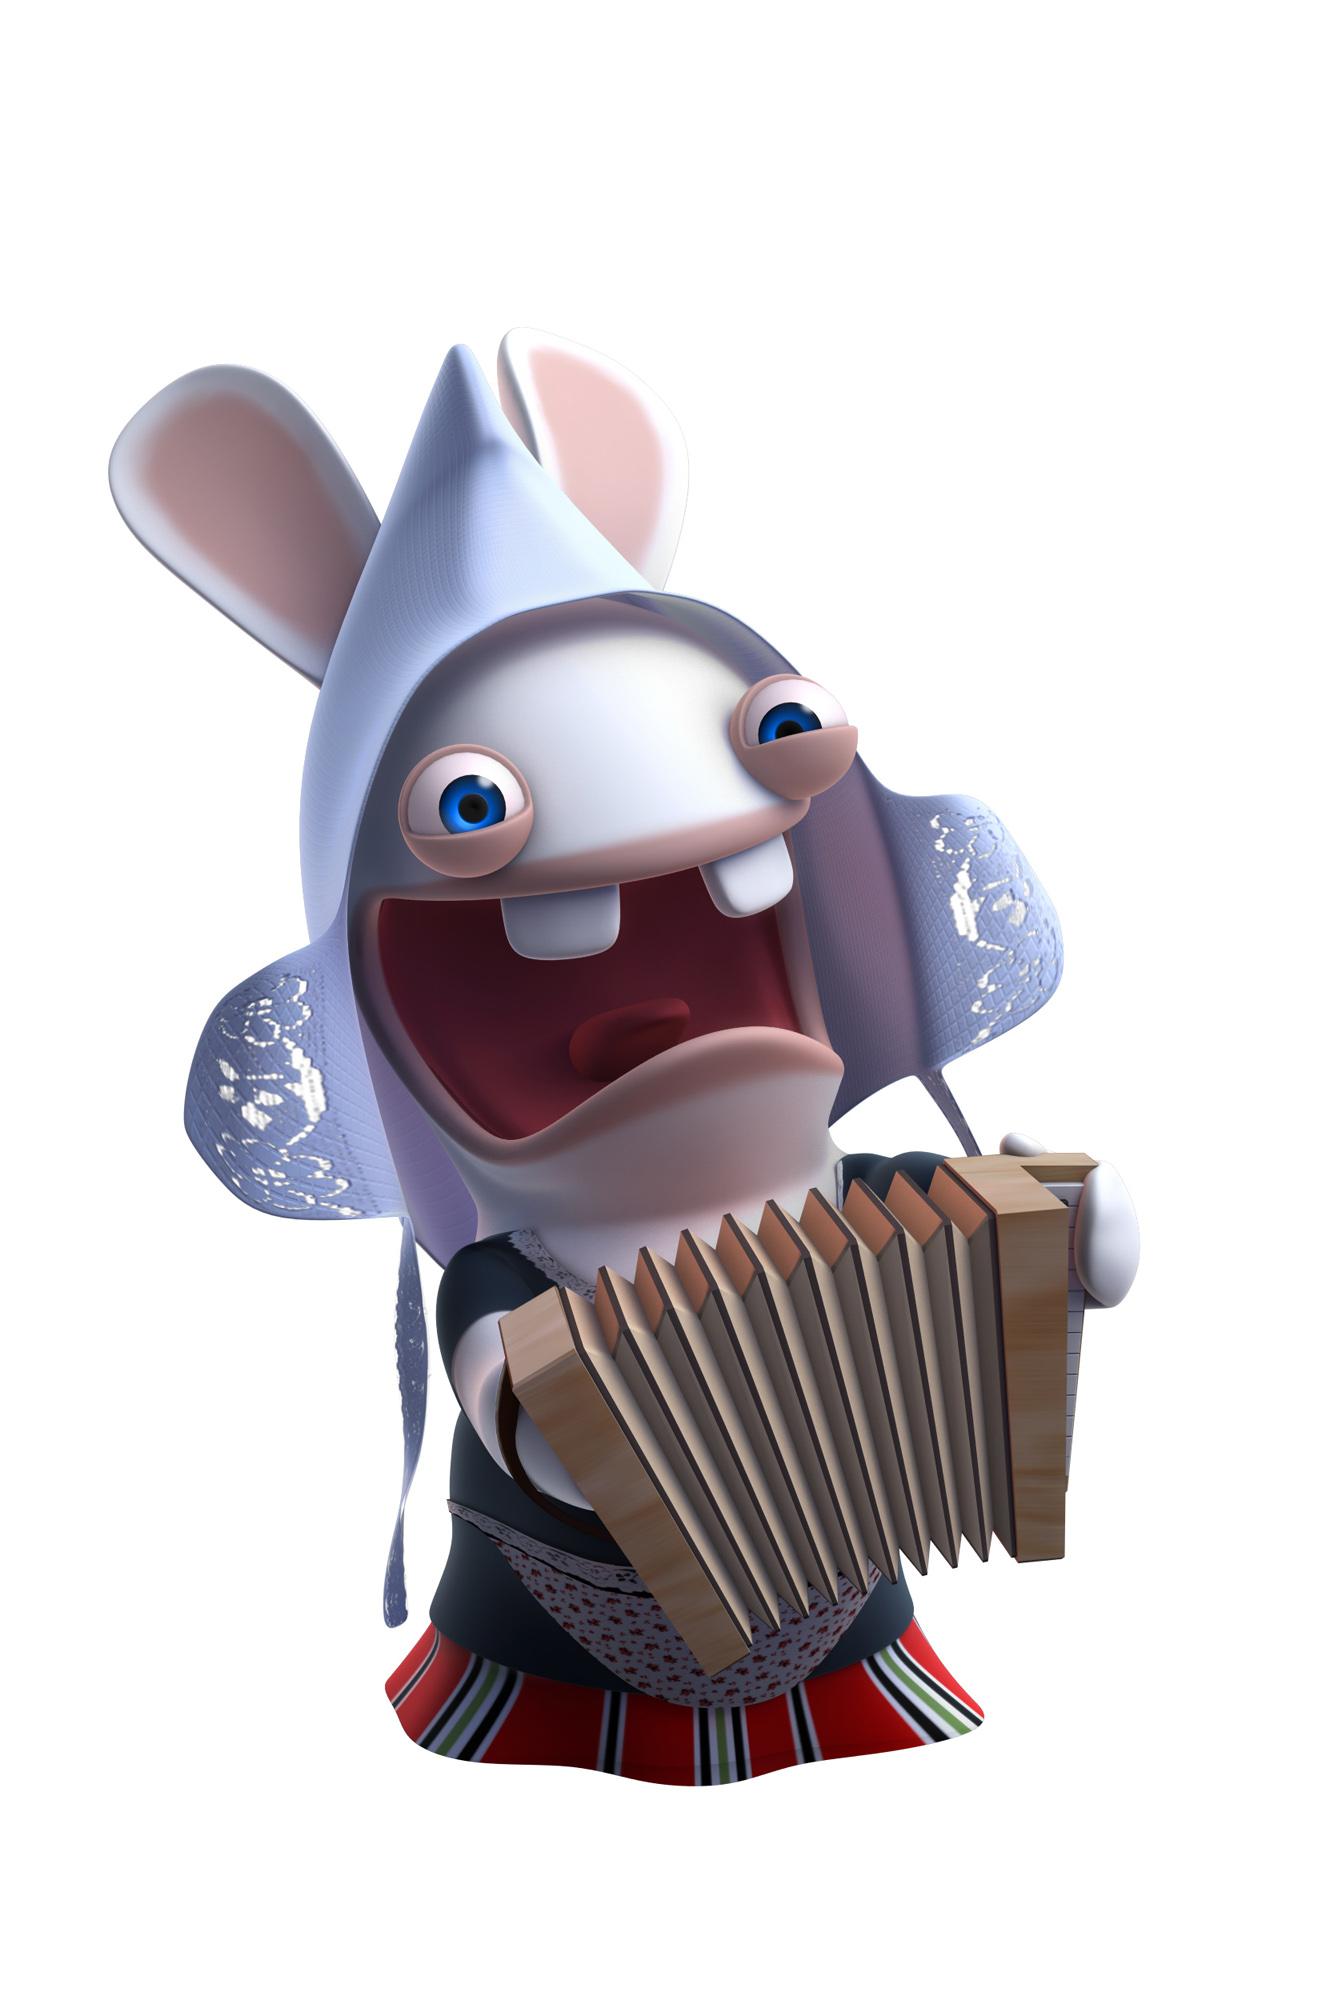 News agenda les lapins cr tins envahissent la bwaaahtagne - Lapin cretin image ...